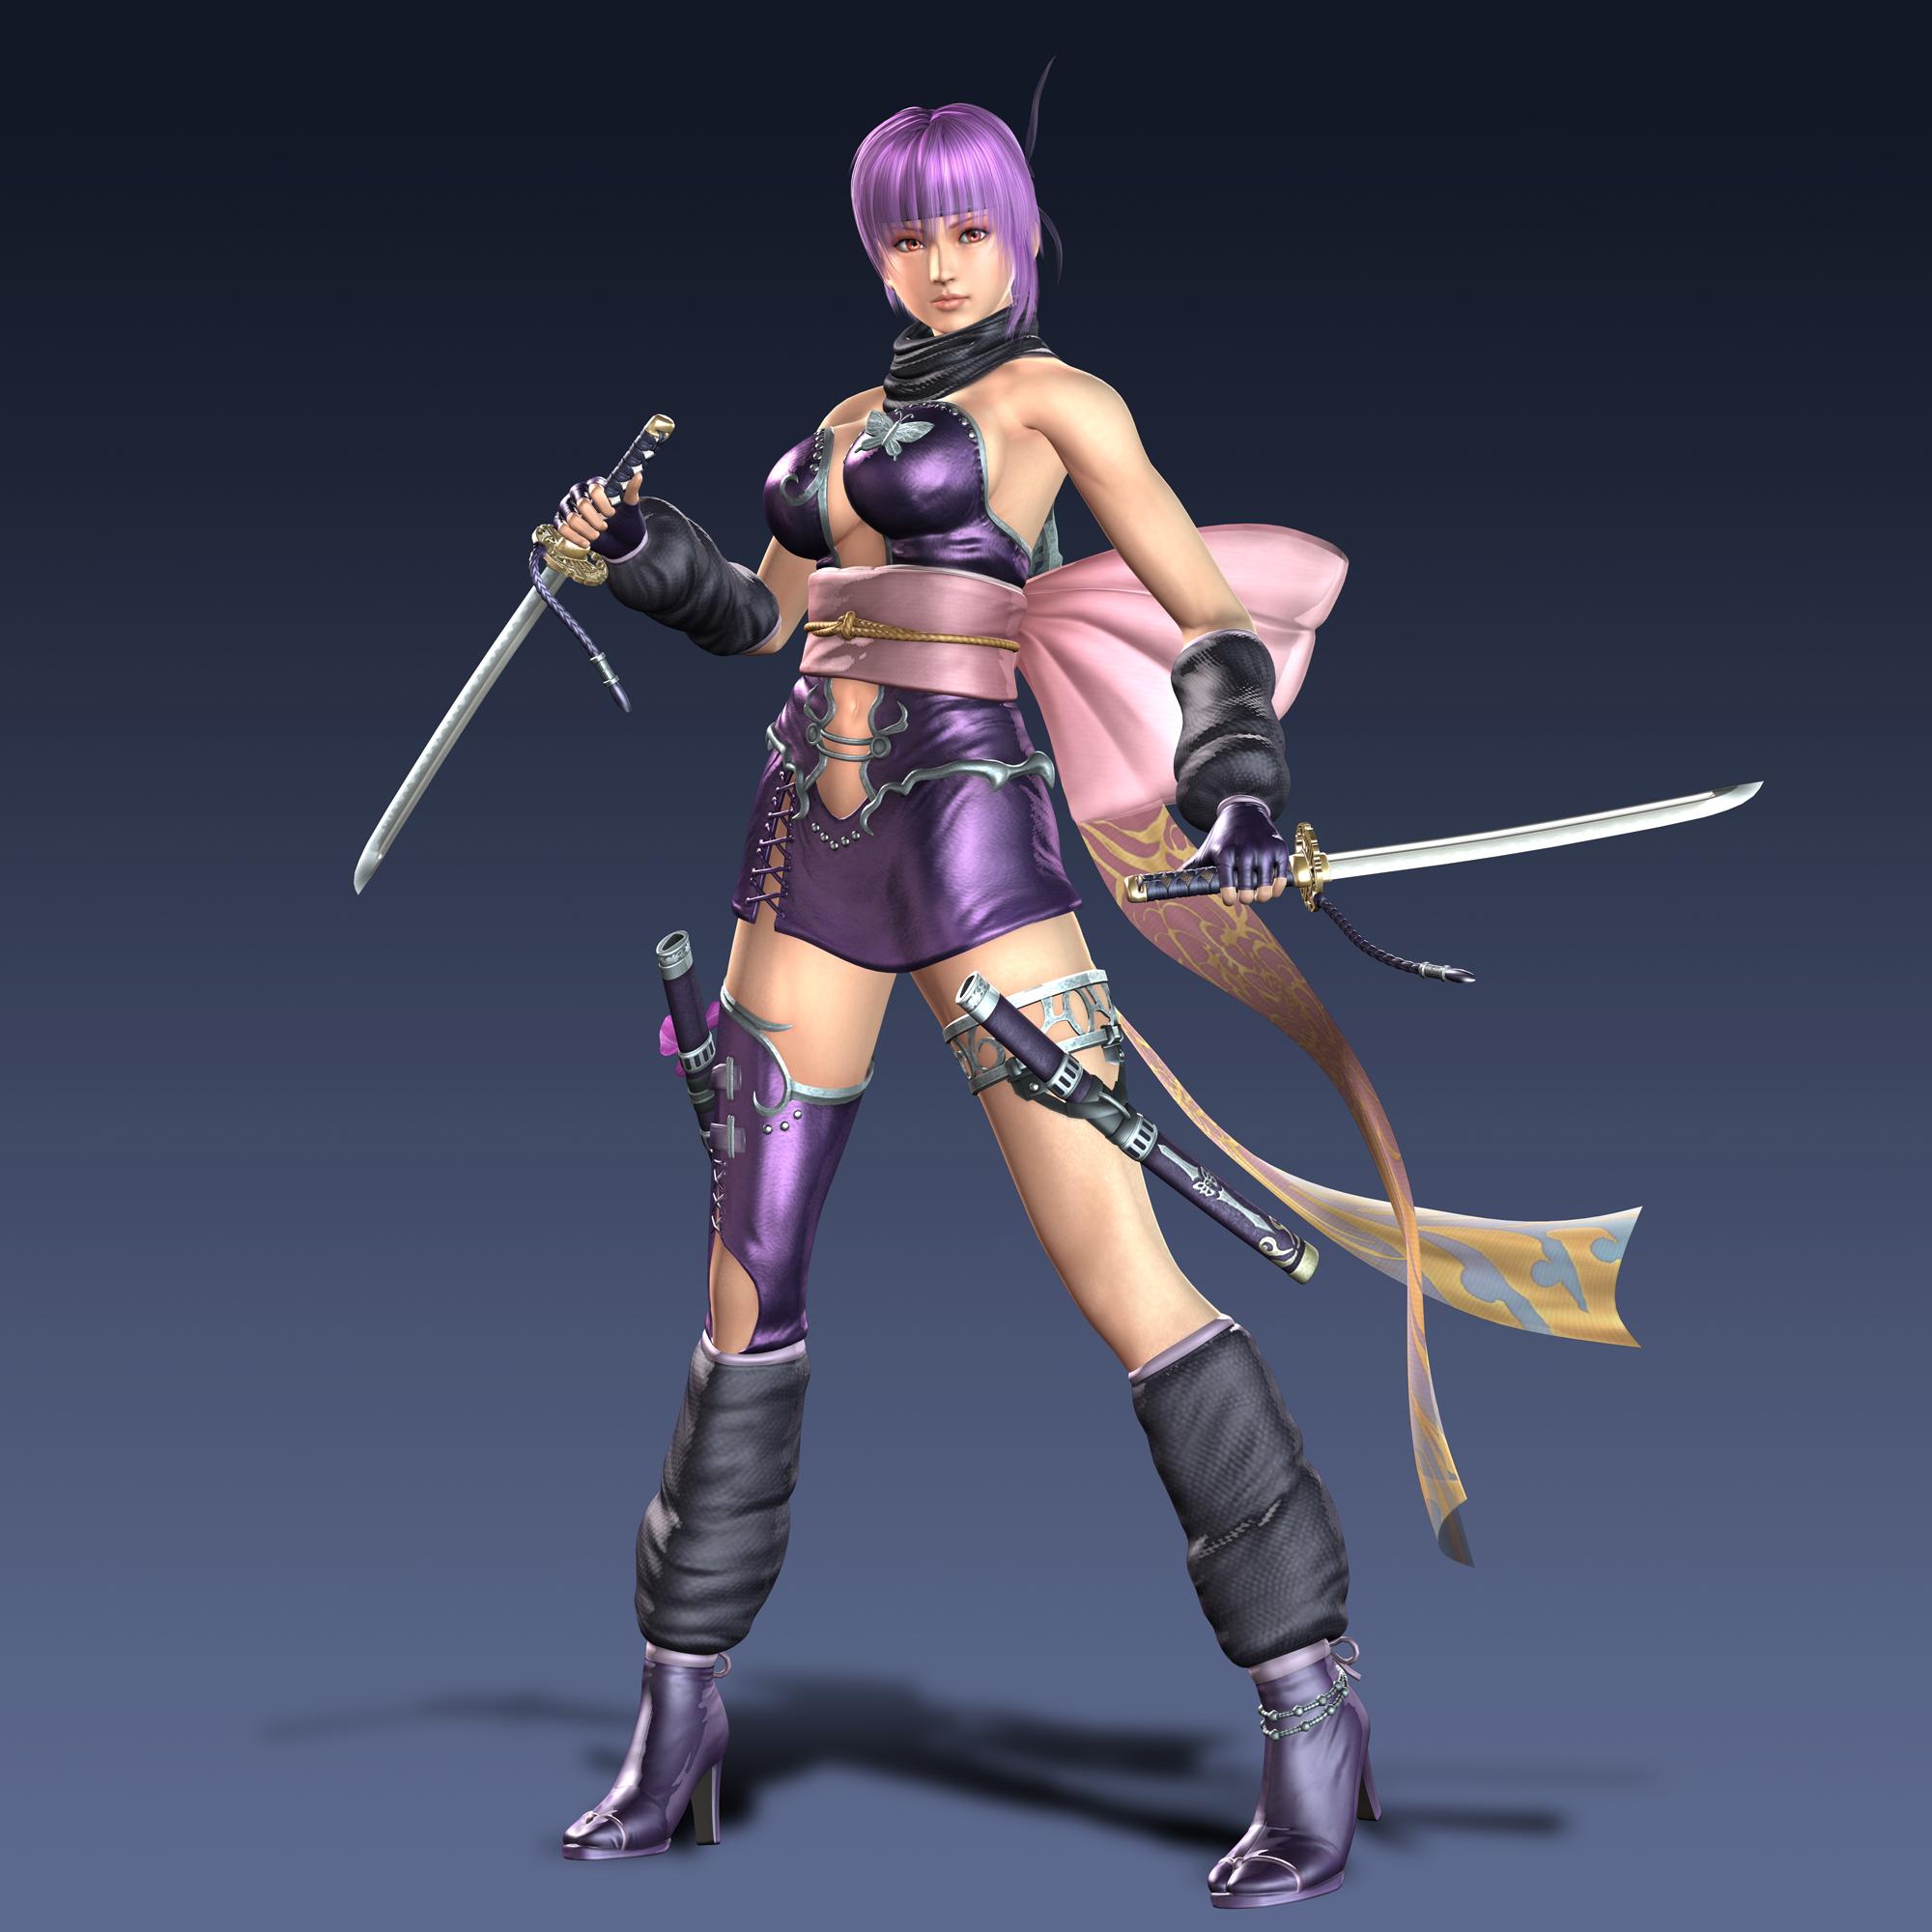 Warriors Orochi 3 Pc Codex: Request Models For XNALara (v2)